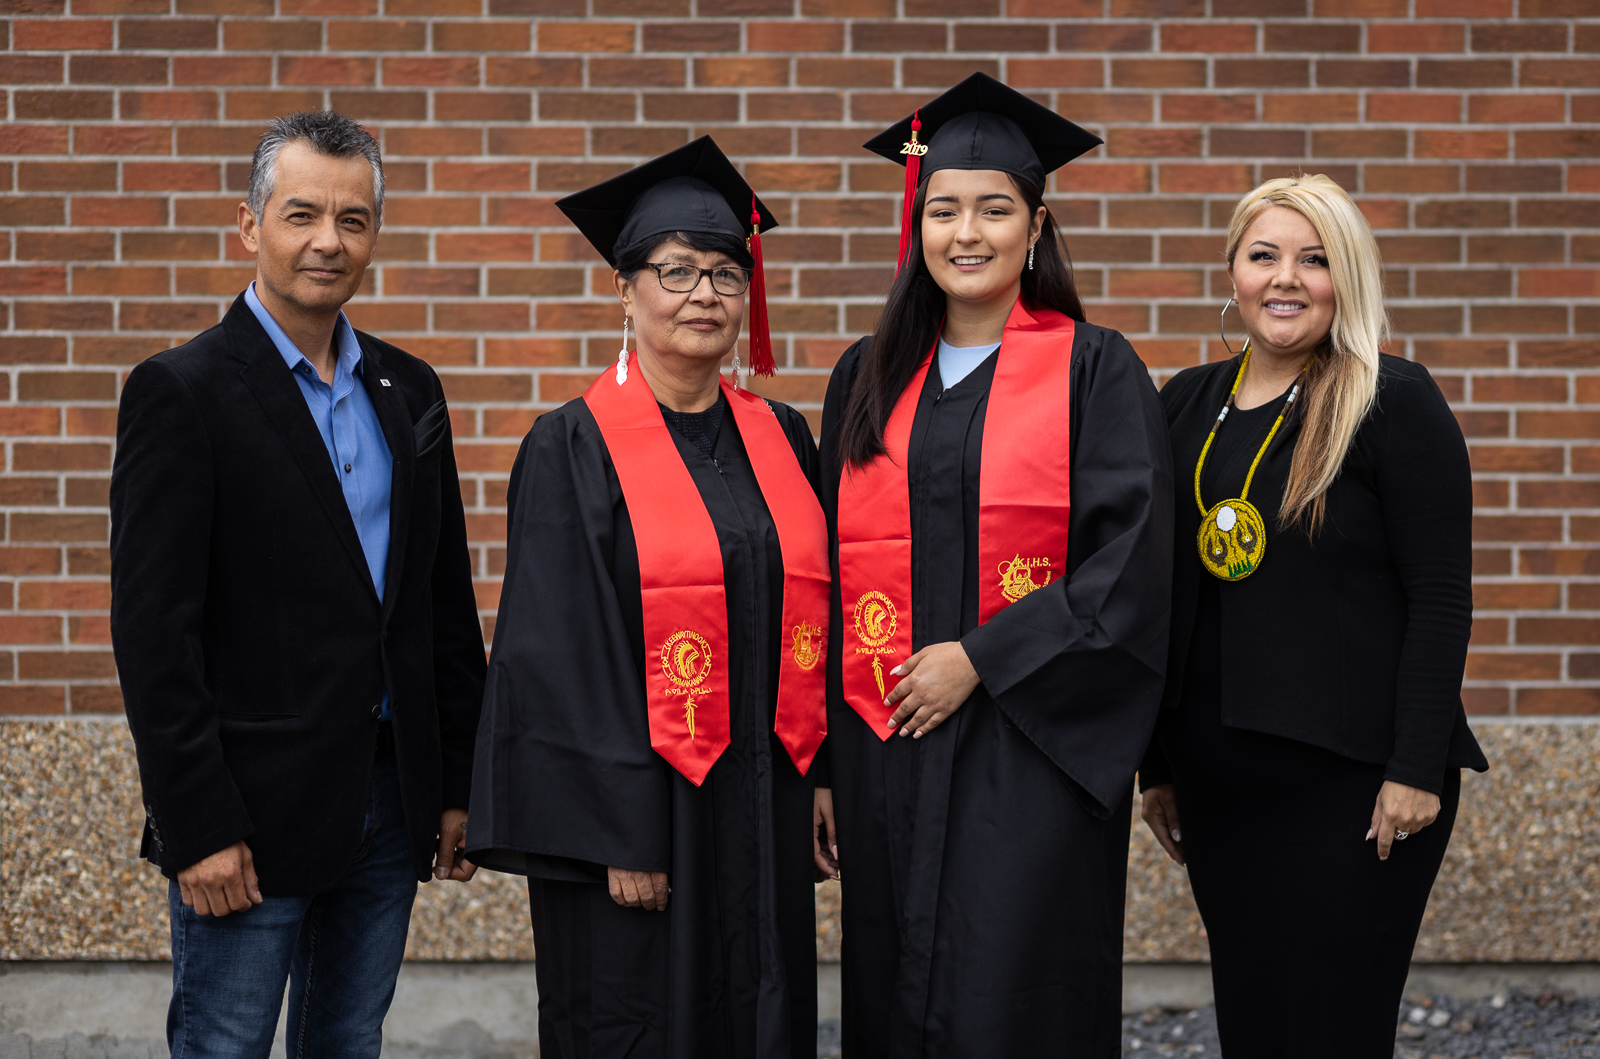 kihs-graduation-2019-fb-2.jpg